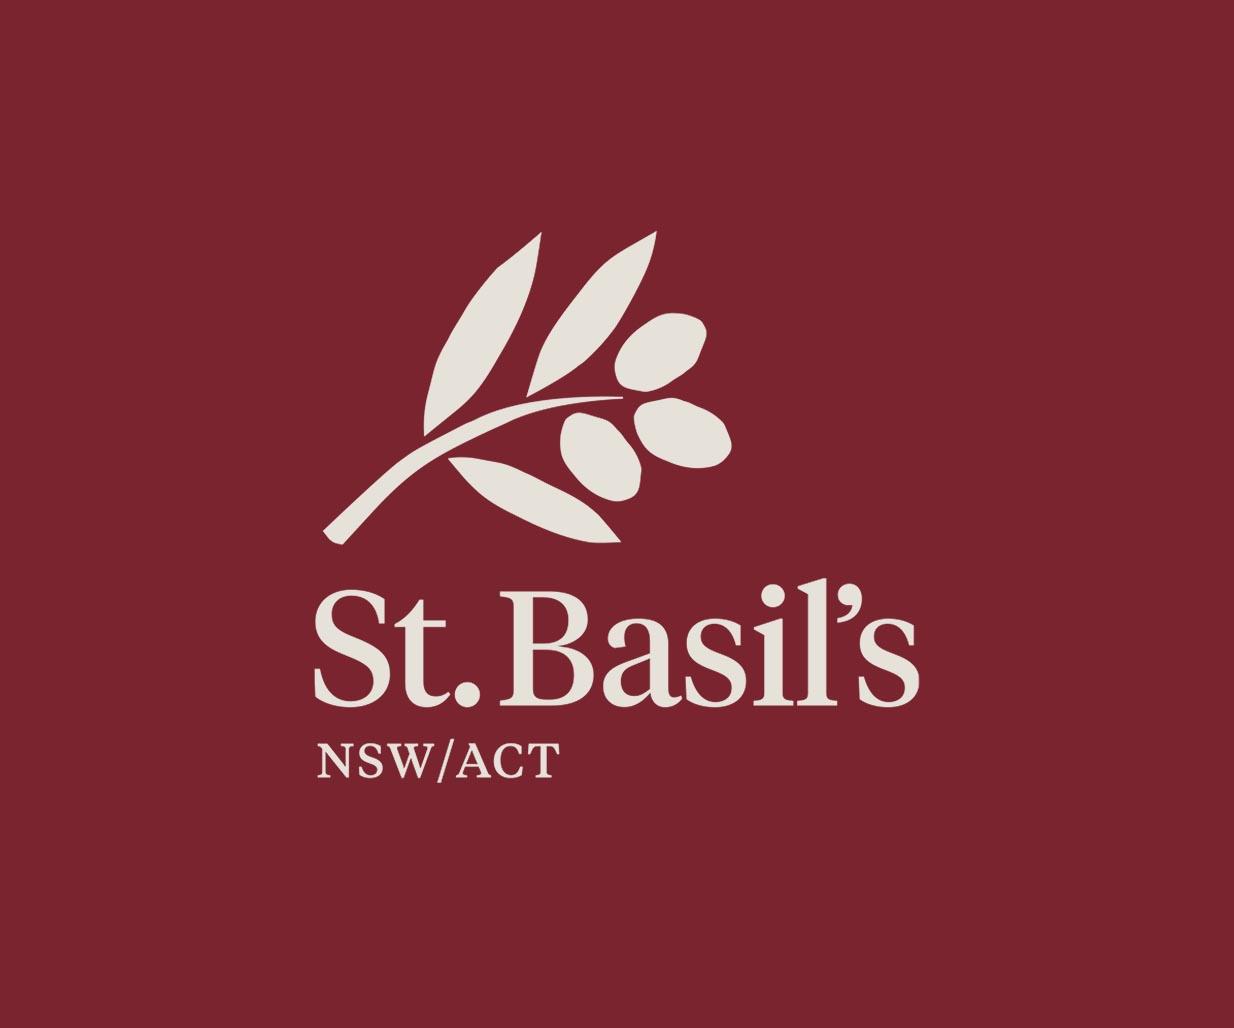 Internal Communications Design project for St Basil's community service, Sydney, Australia image A